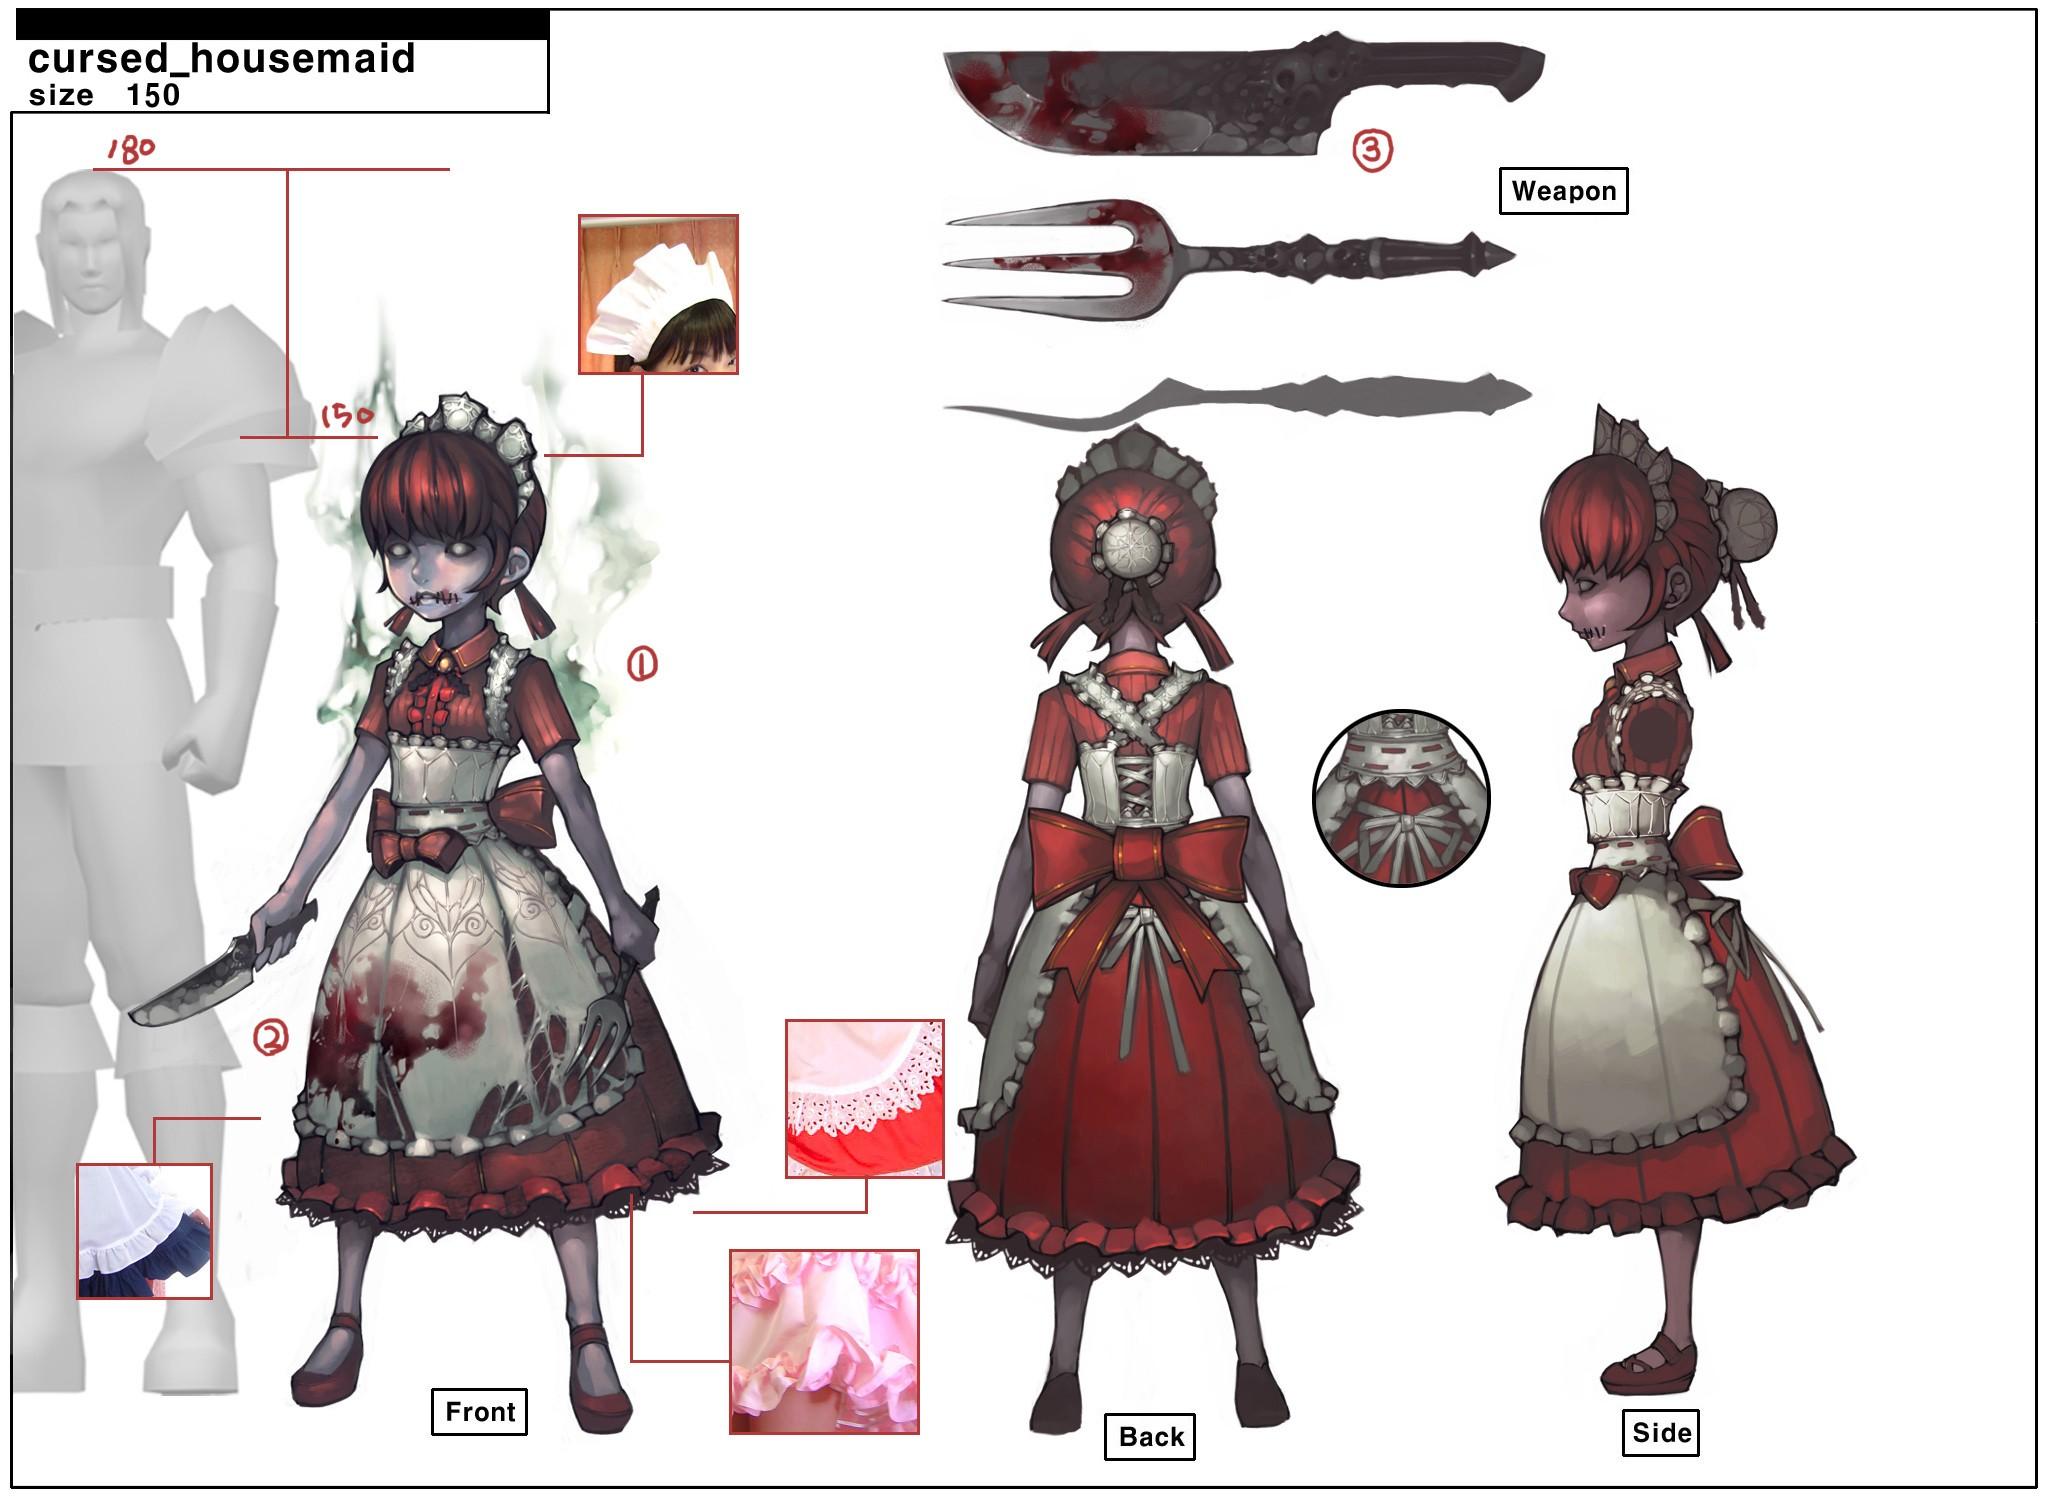 cursed_housemaid.jpg